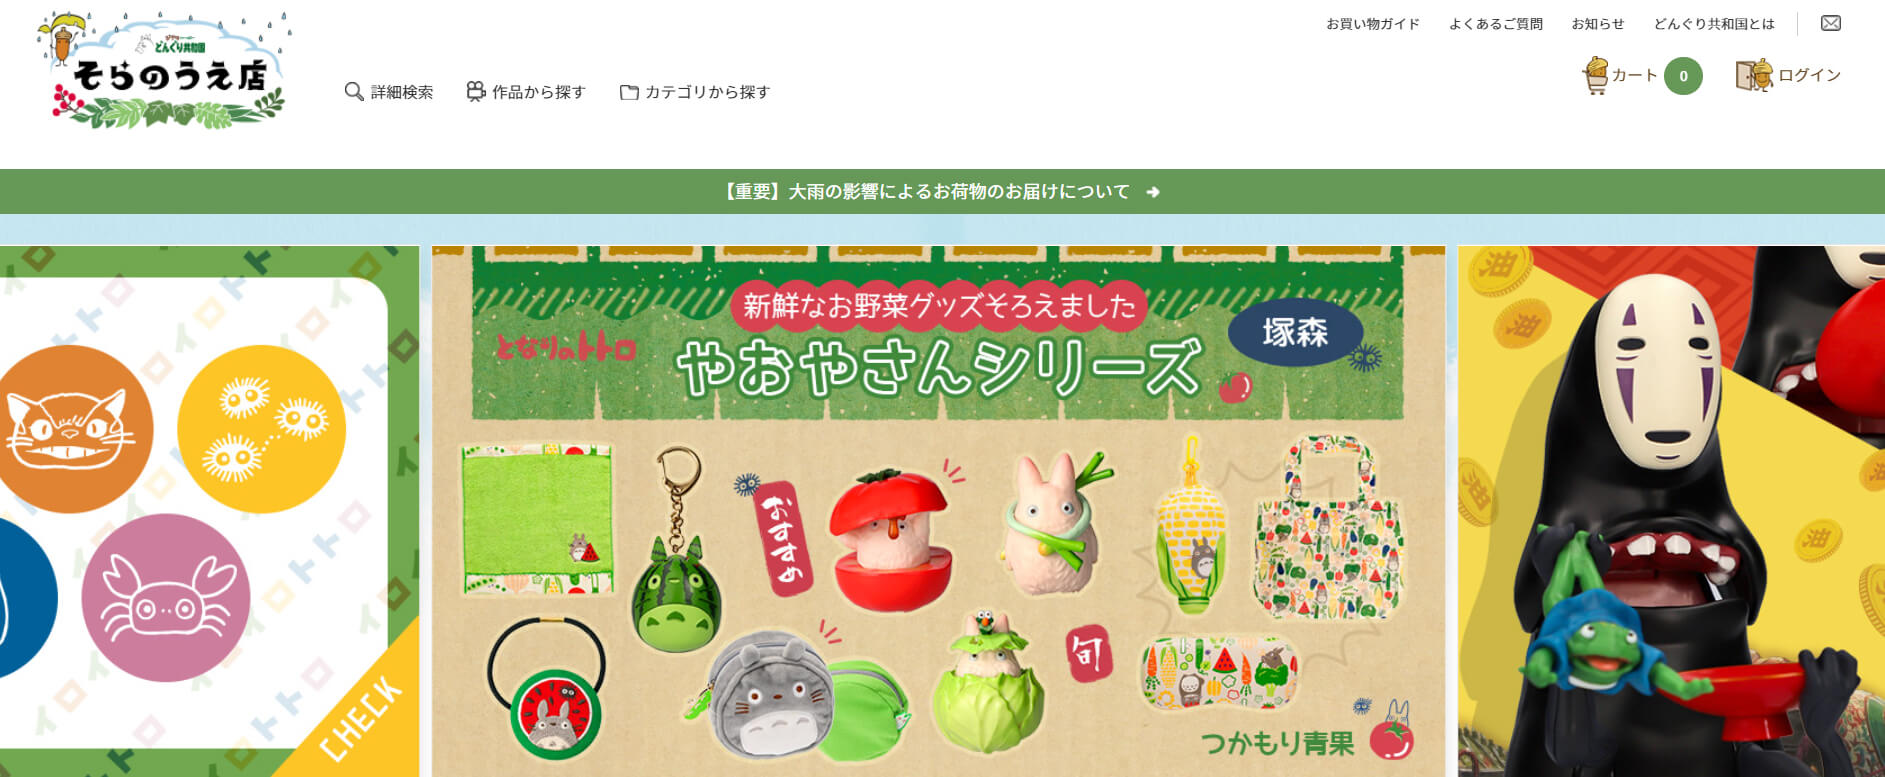 Studio Ghibli Donguri Sora Online Store homepage